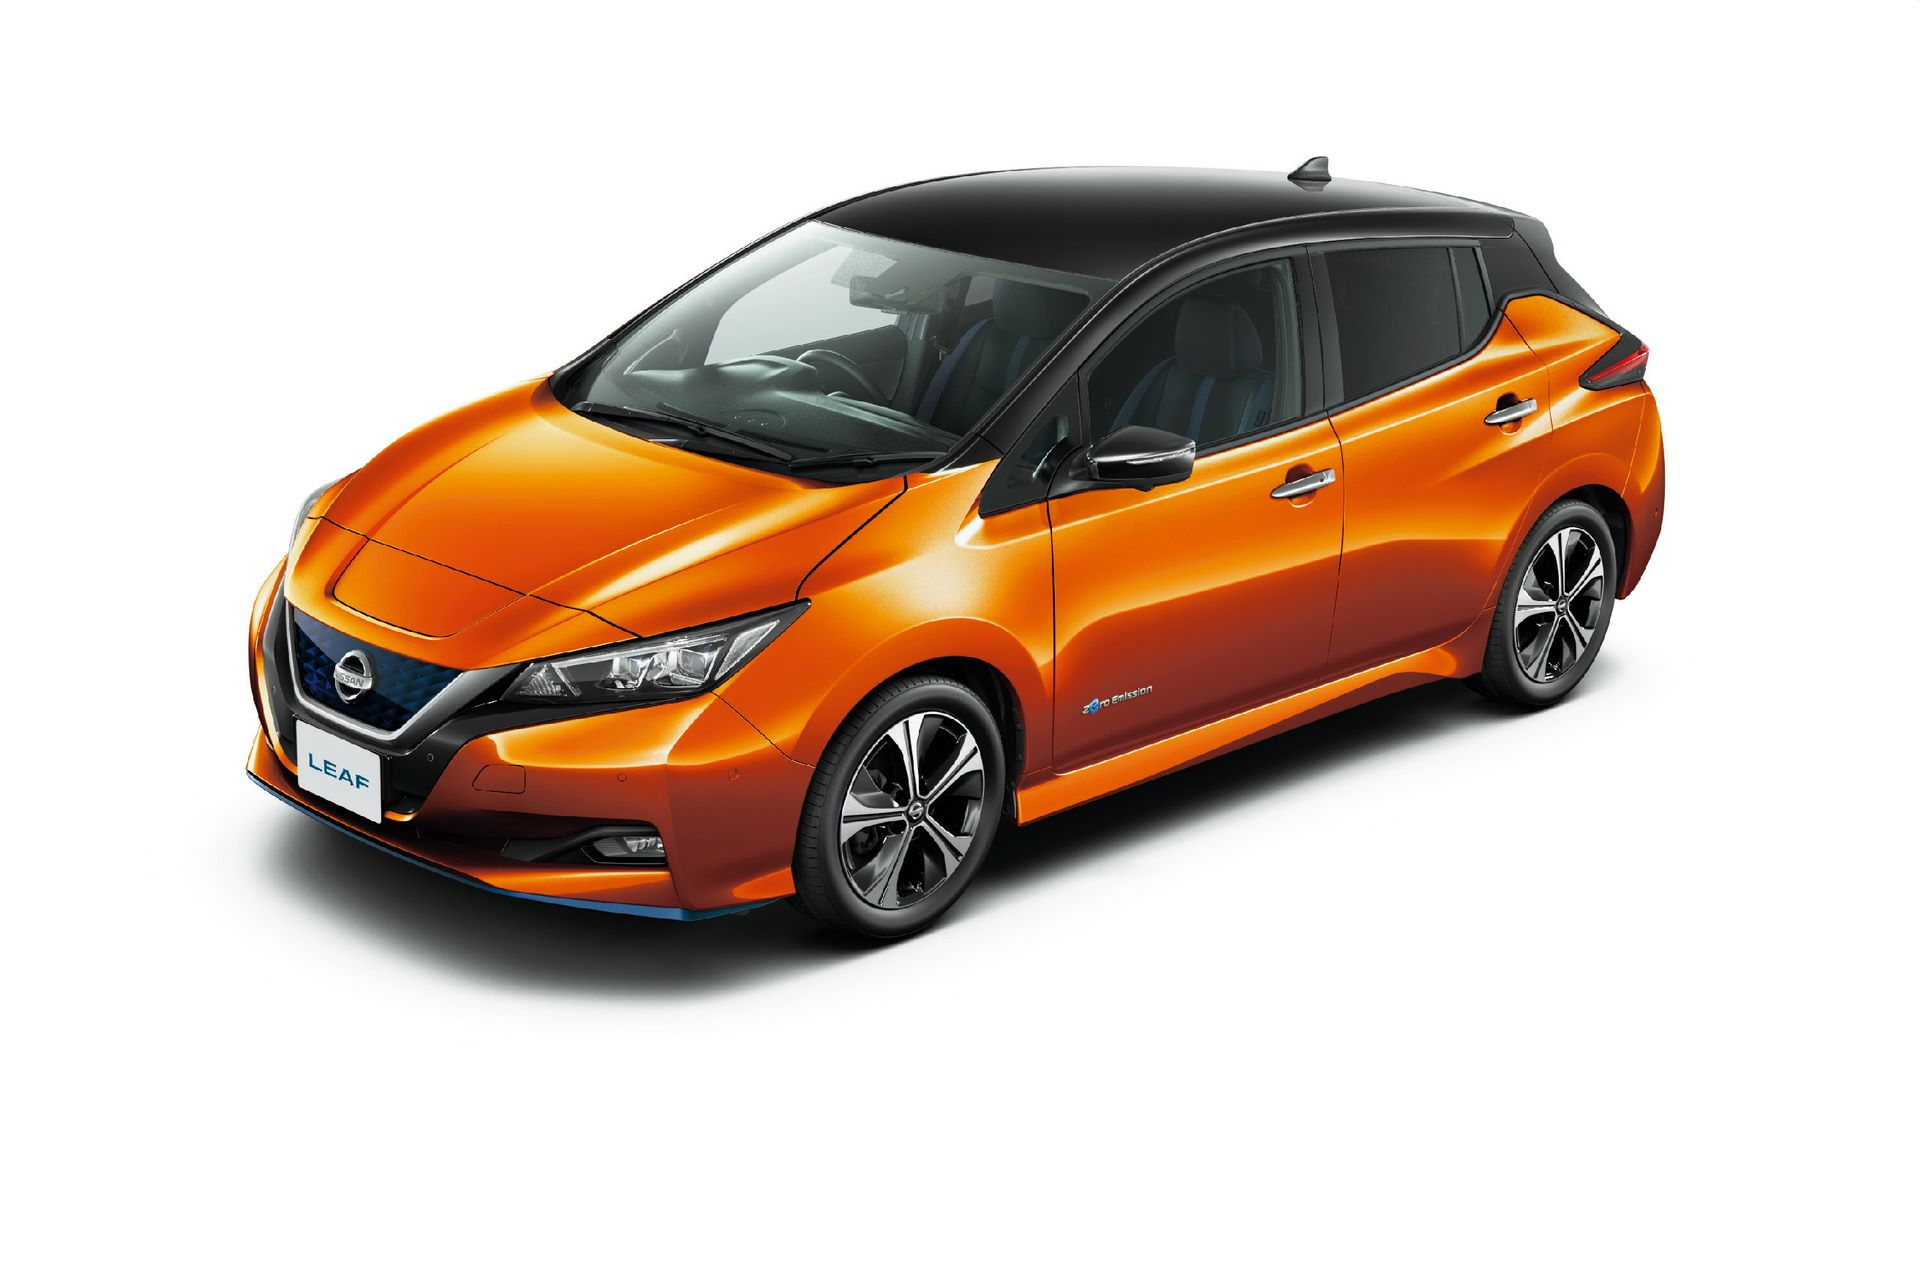 Nissan-leaf-japan-2020-9